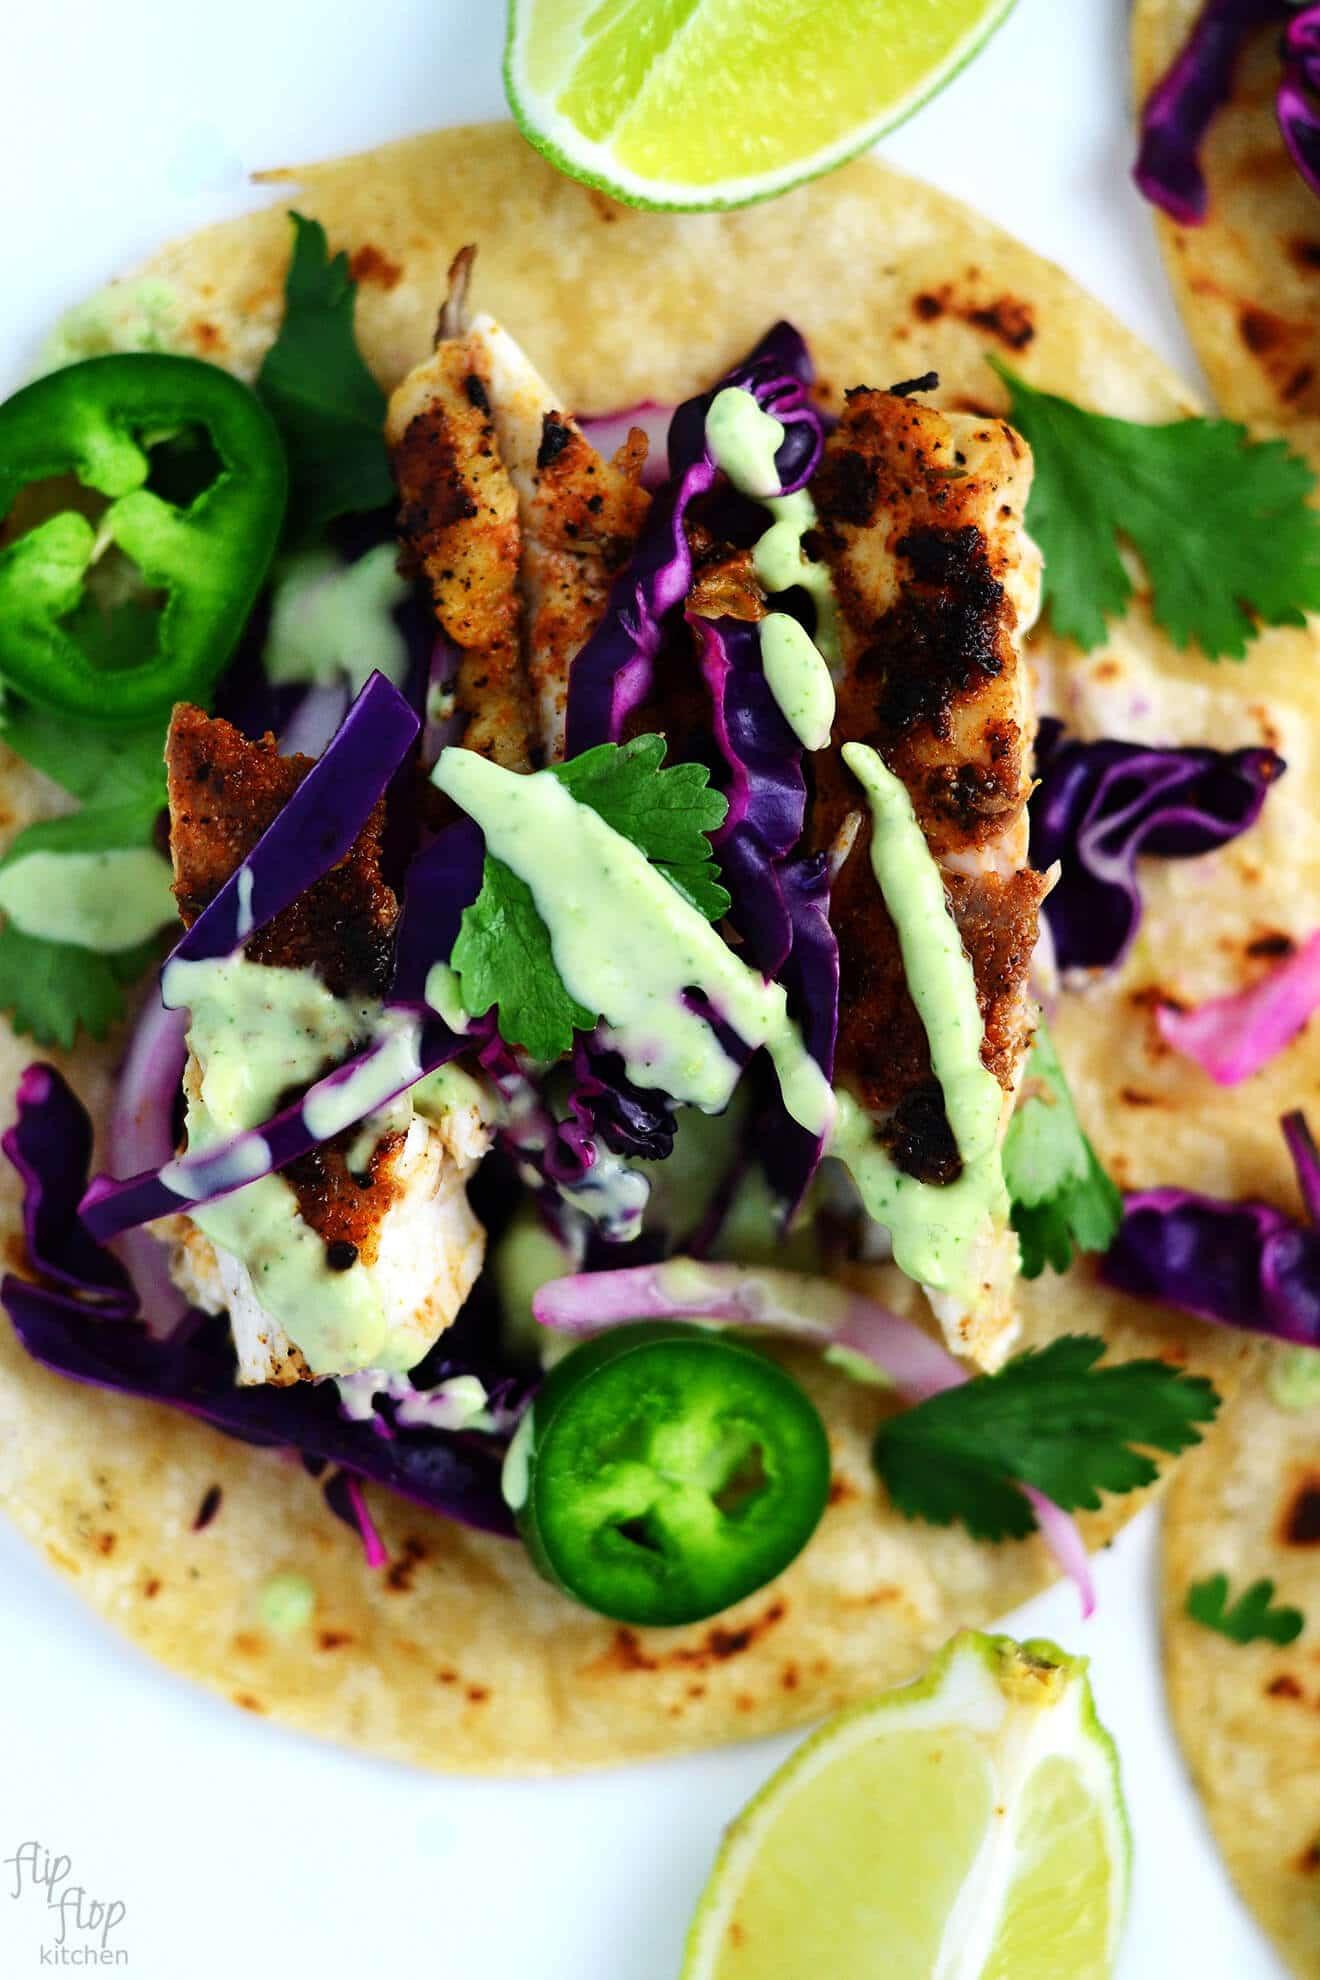 Fish Taco clipart tortilla Tacos Slaw Cabbage Red So